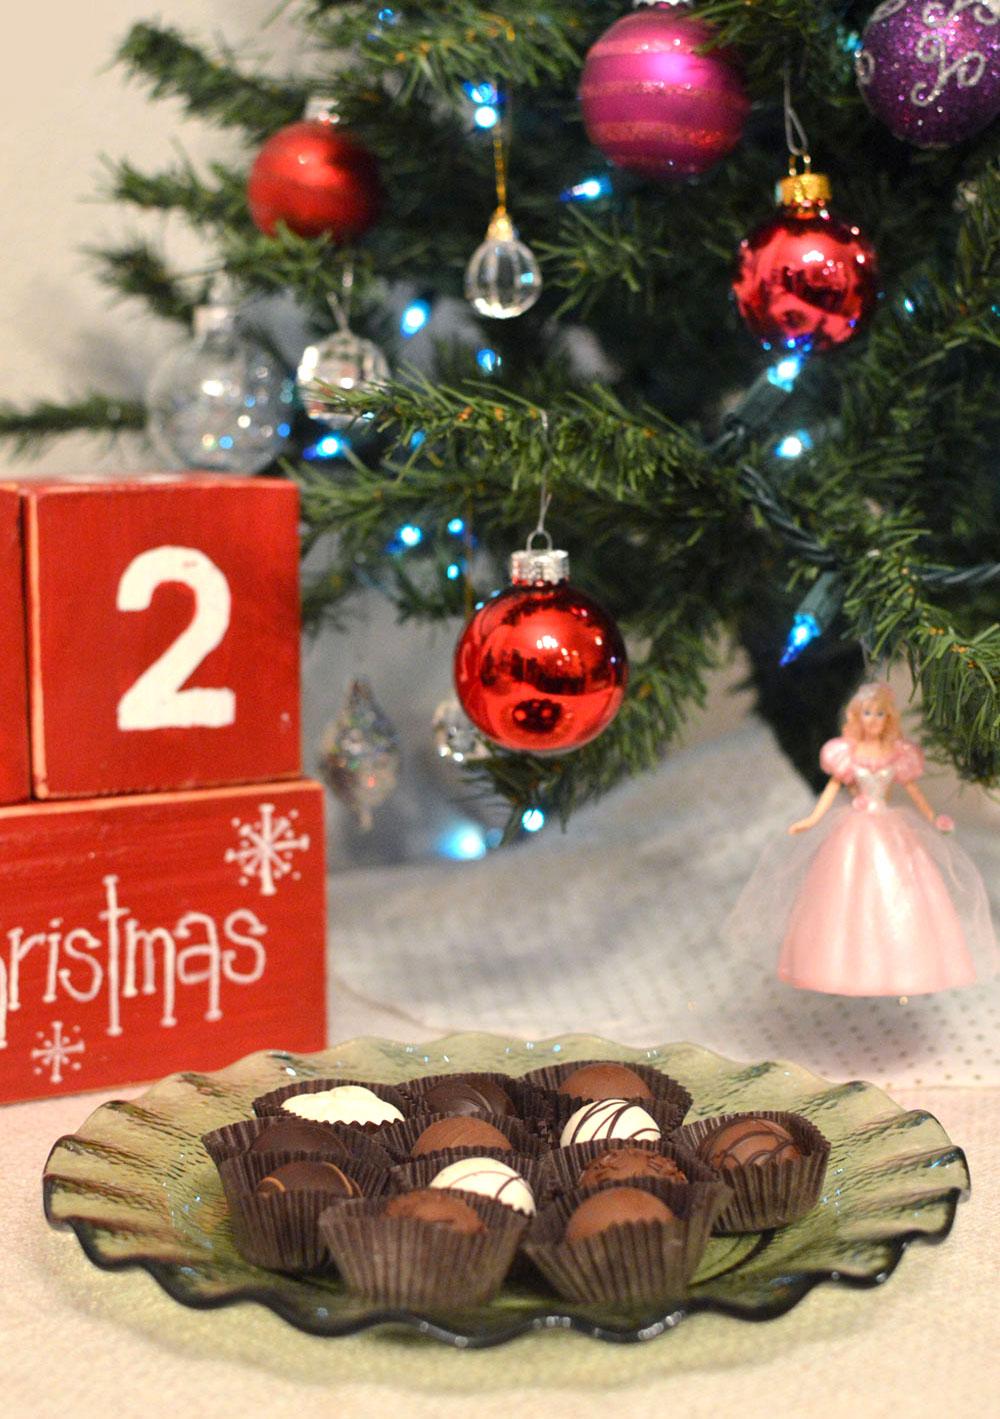 Christmas Holiday Treats from Shari's Berries